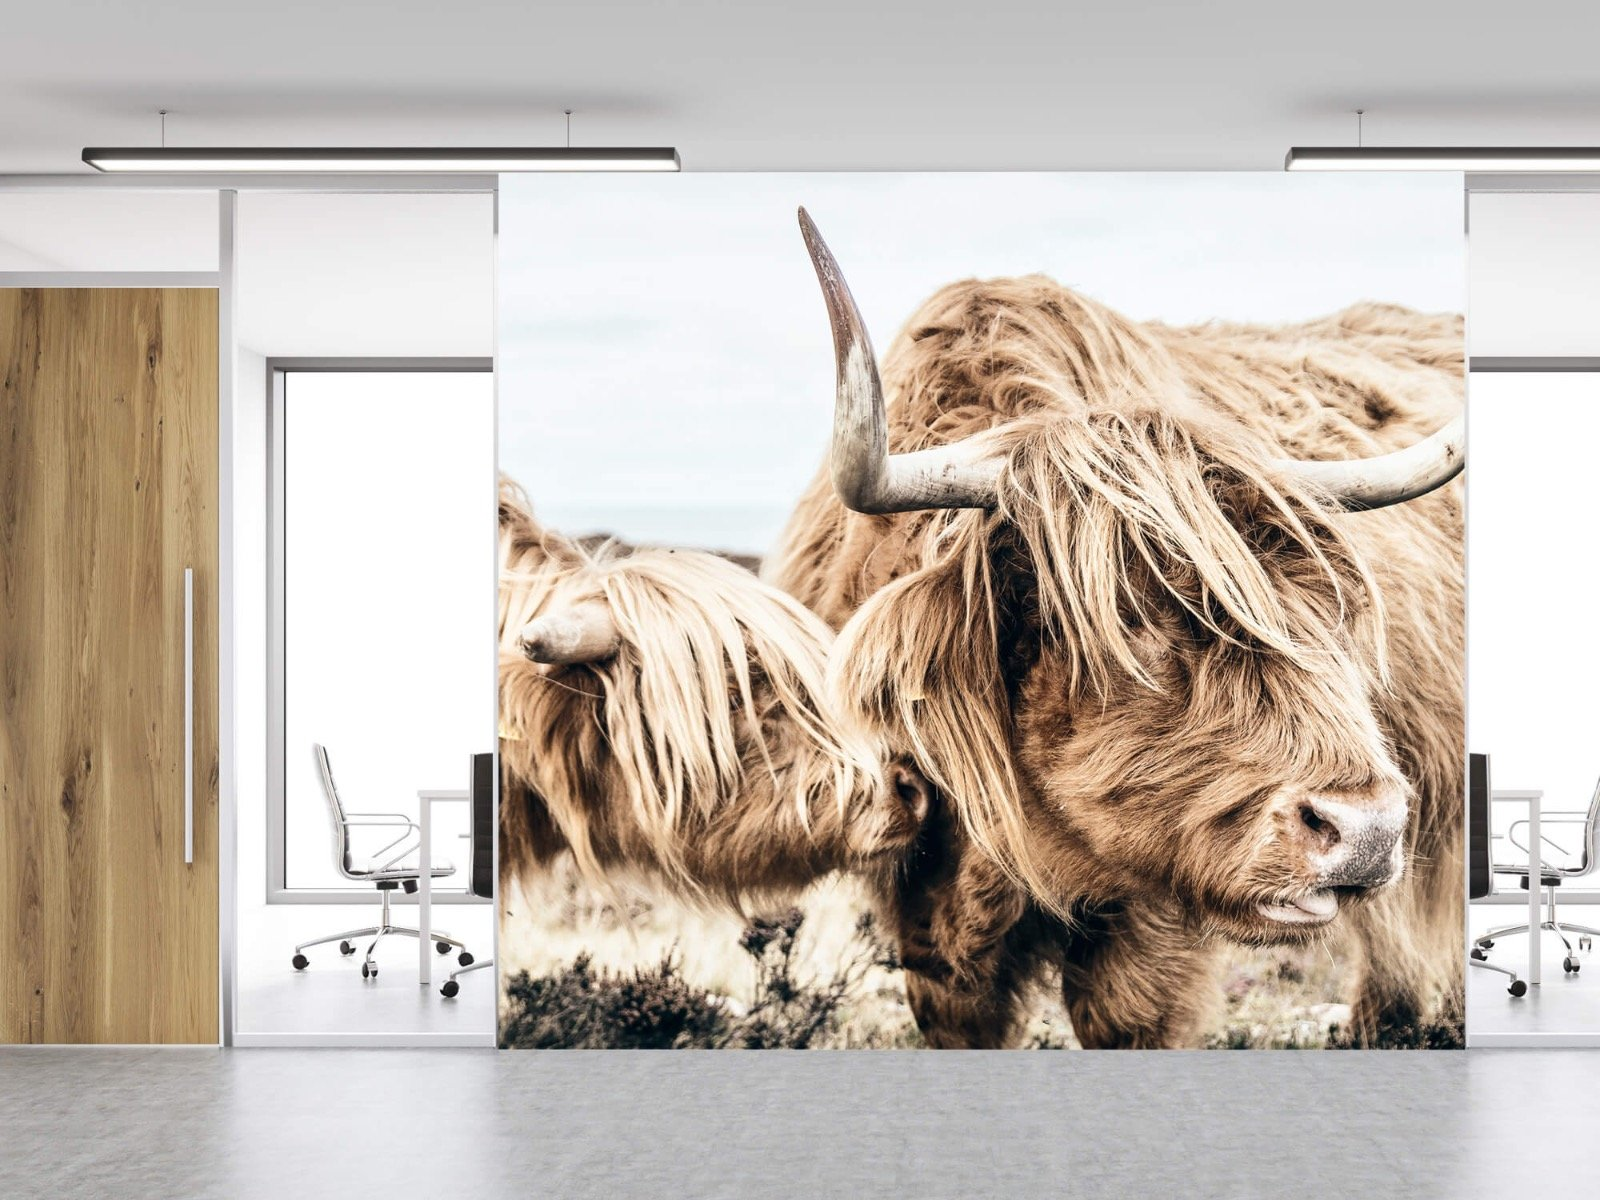 Hooglanders - Twee Schotse hooglanders - Slaapkamer 12